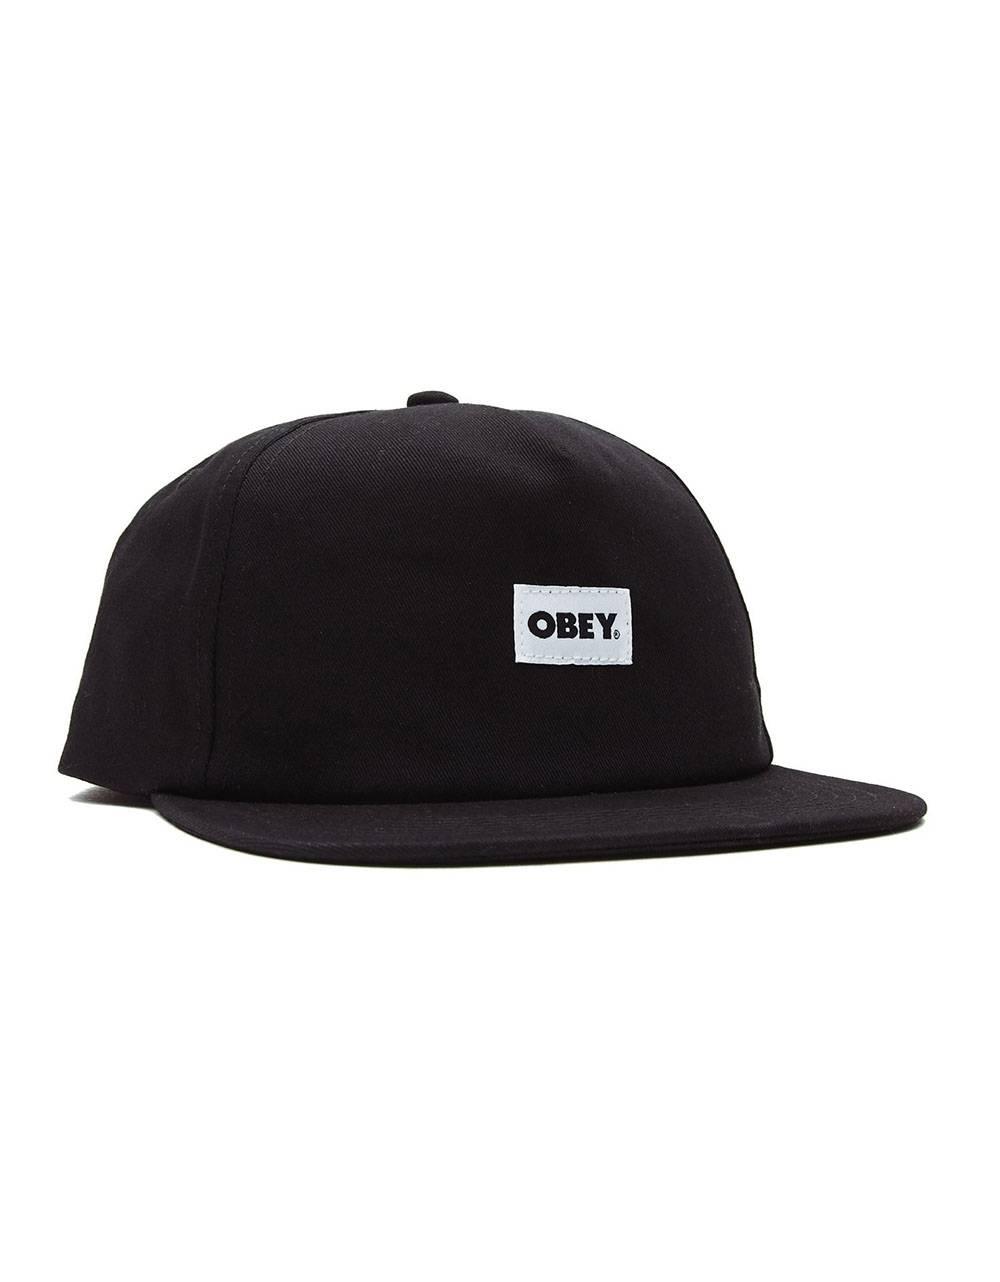 Obey bold label 6 panel strapback hat - black obey Hat 36,89€